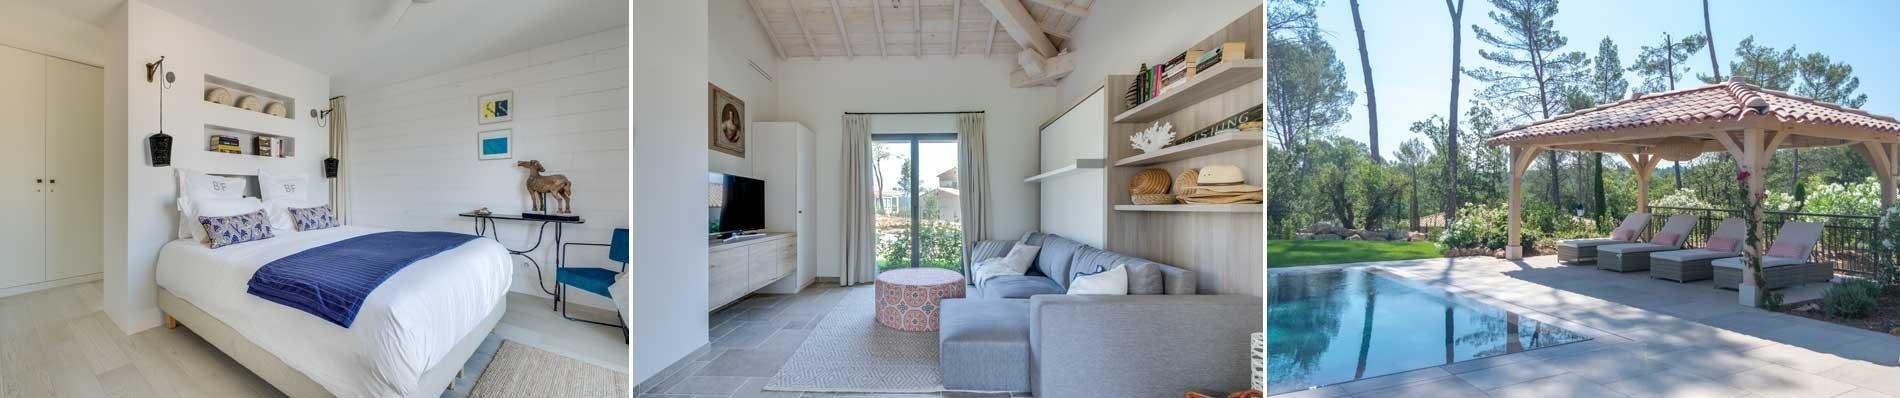 vakantiehuis zwembad cote d azur provence villa zwembad paradise